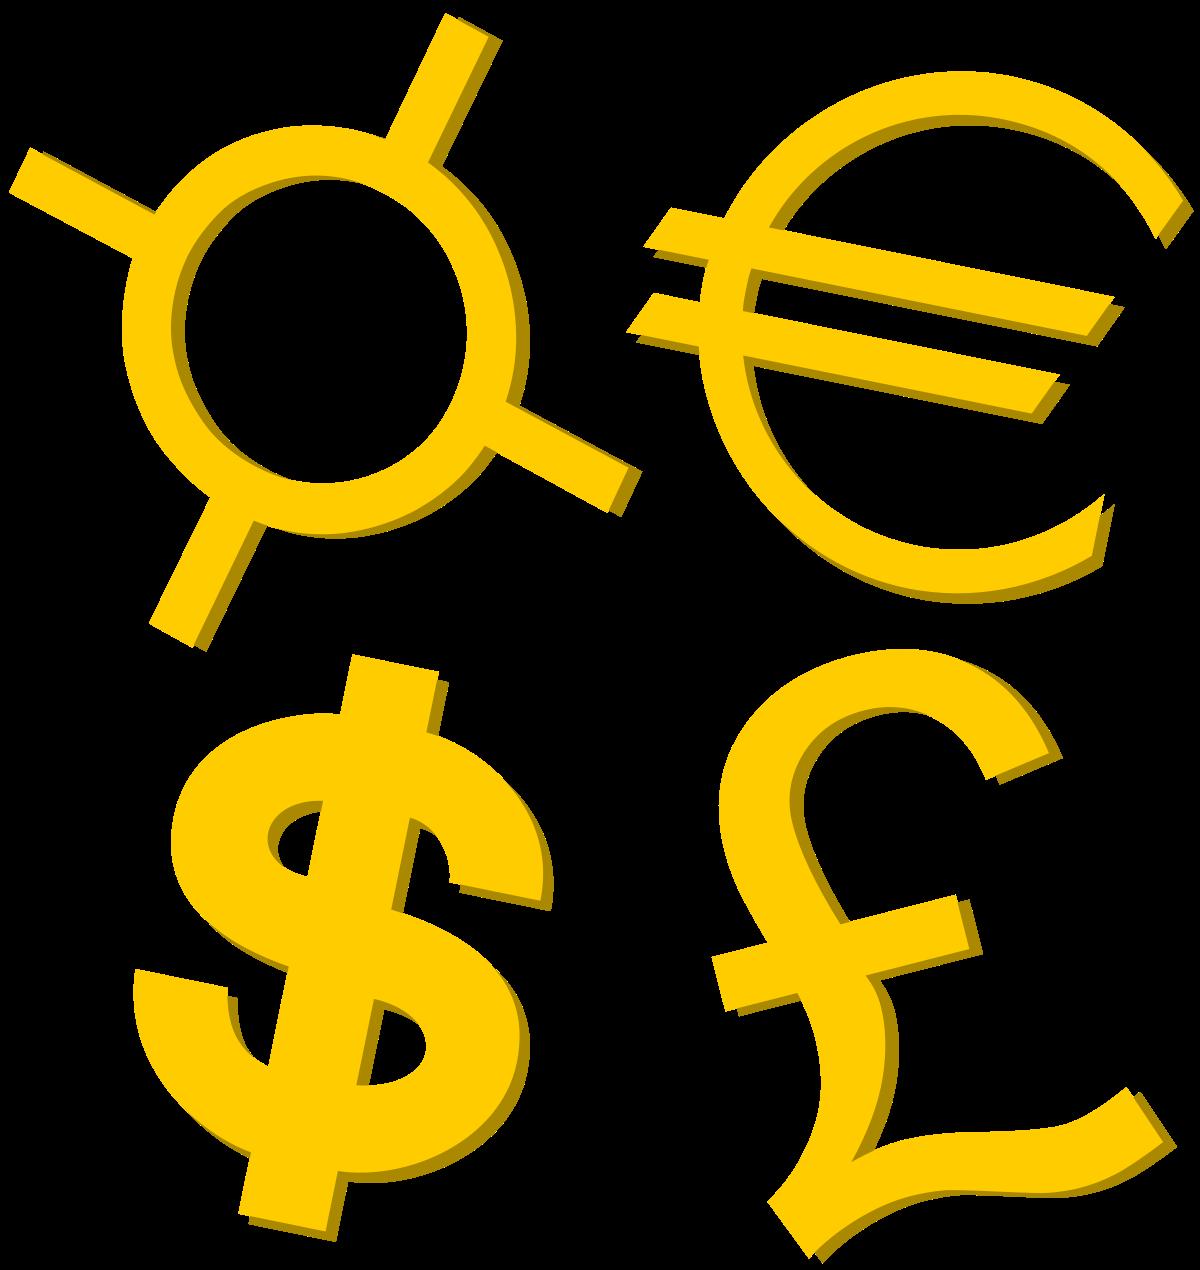 R clipart rupee note. Semn monetar wikipedia